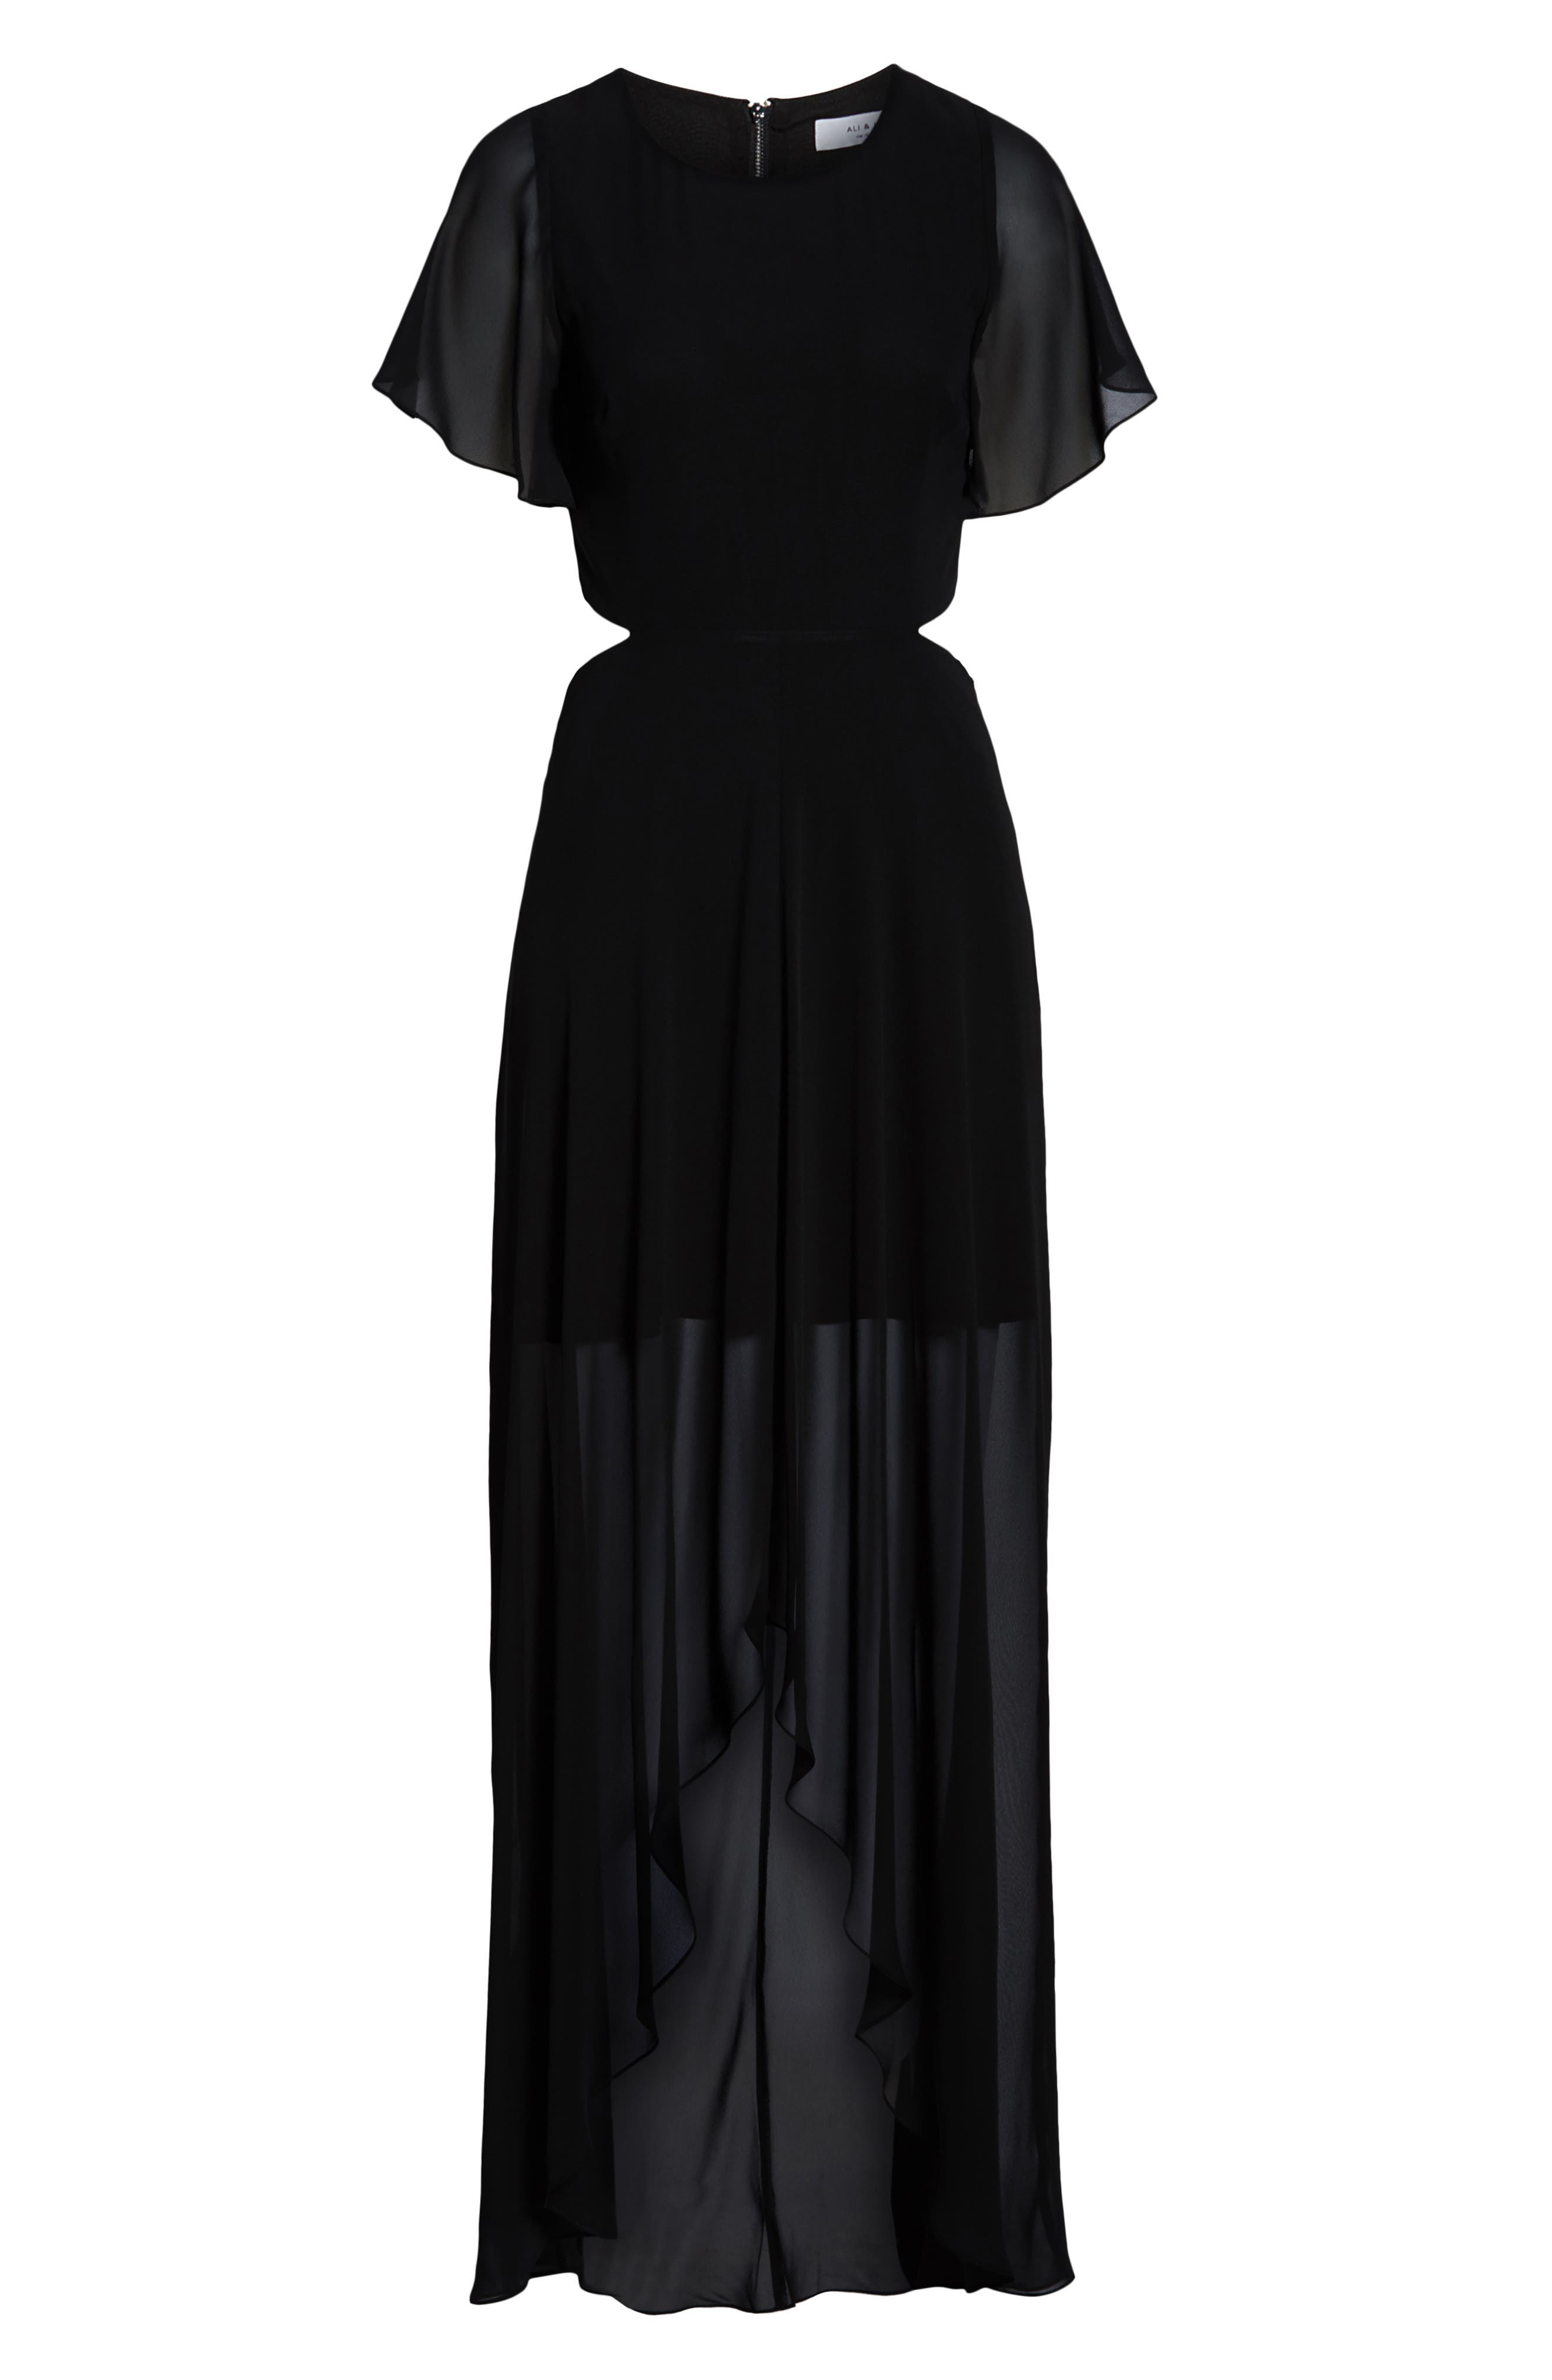 ALI & JAY, Cutout Maxi Dress, Alternate thumbnail 7, color, BLACK